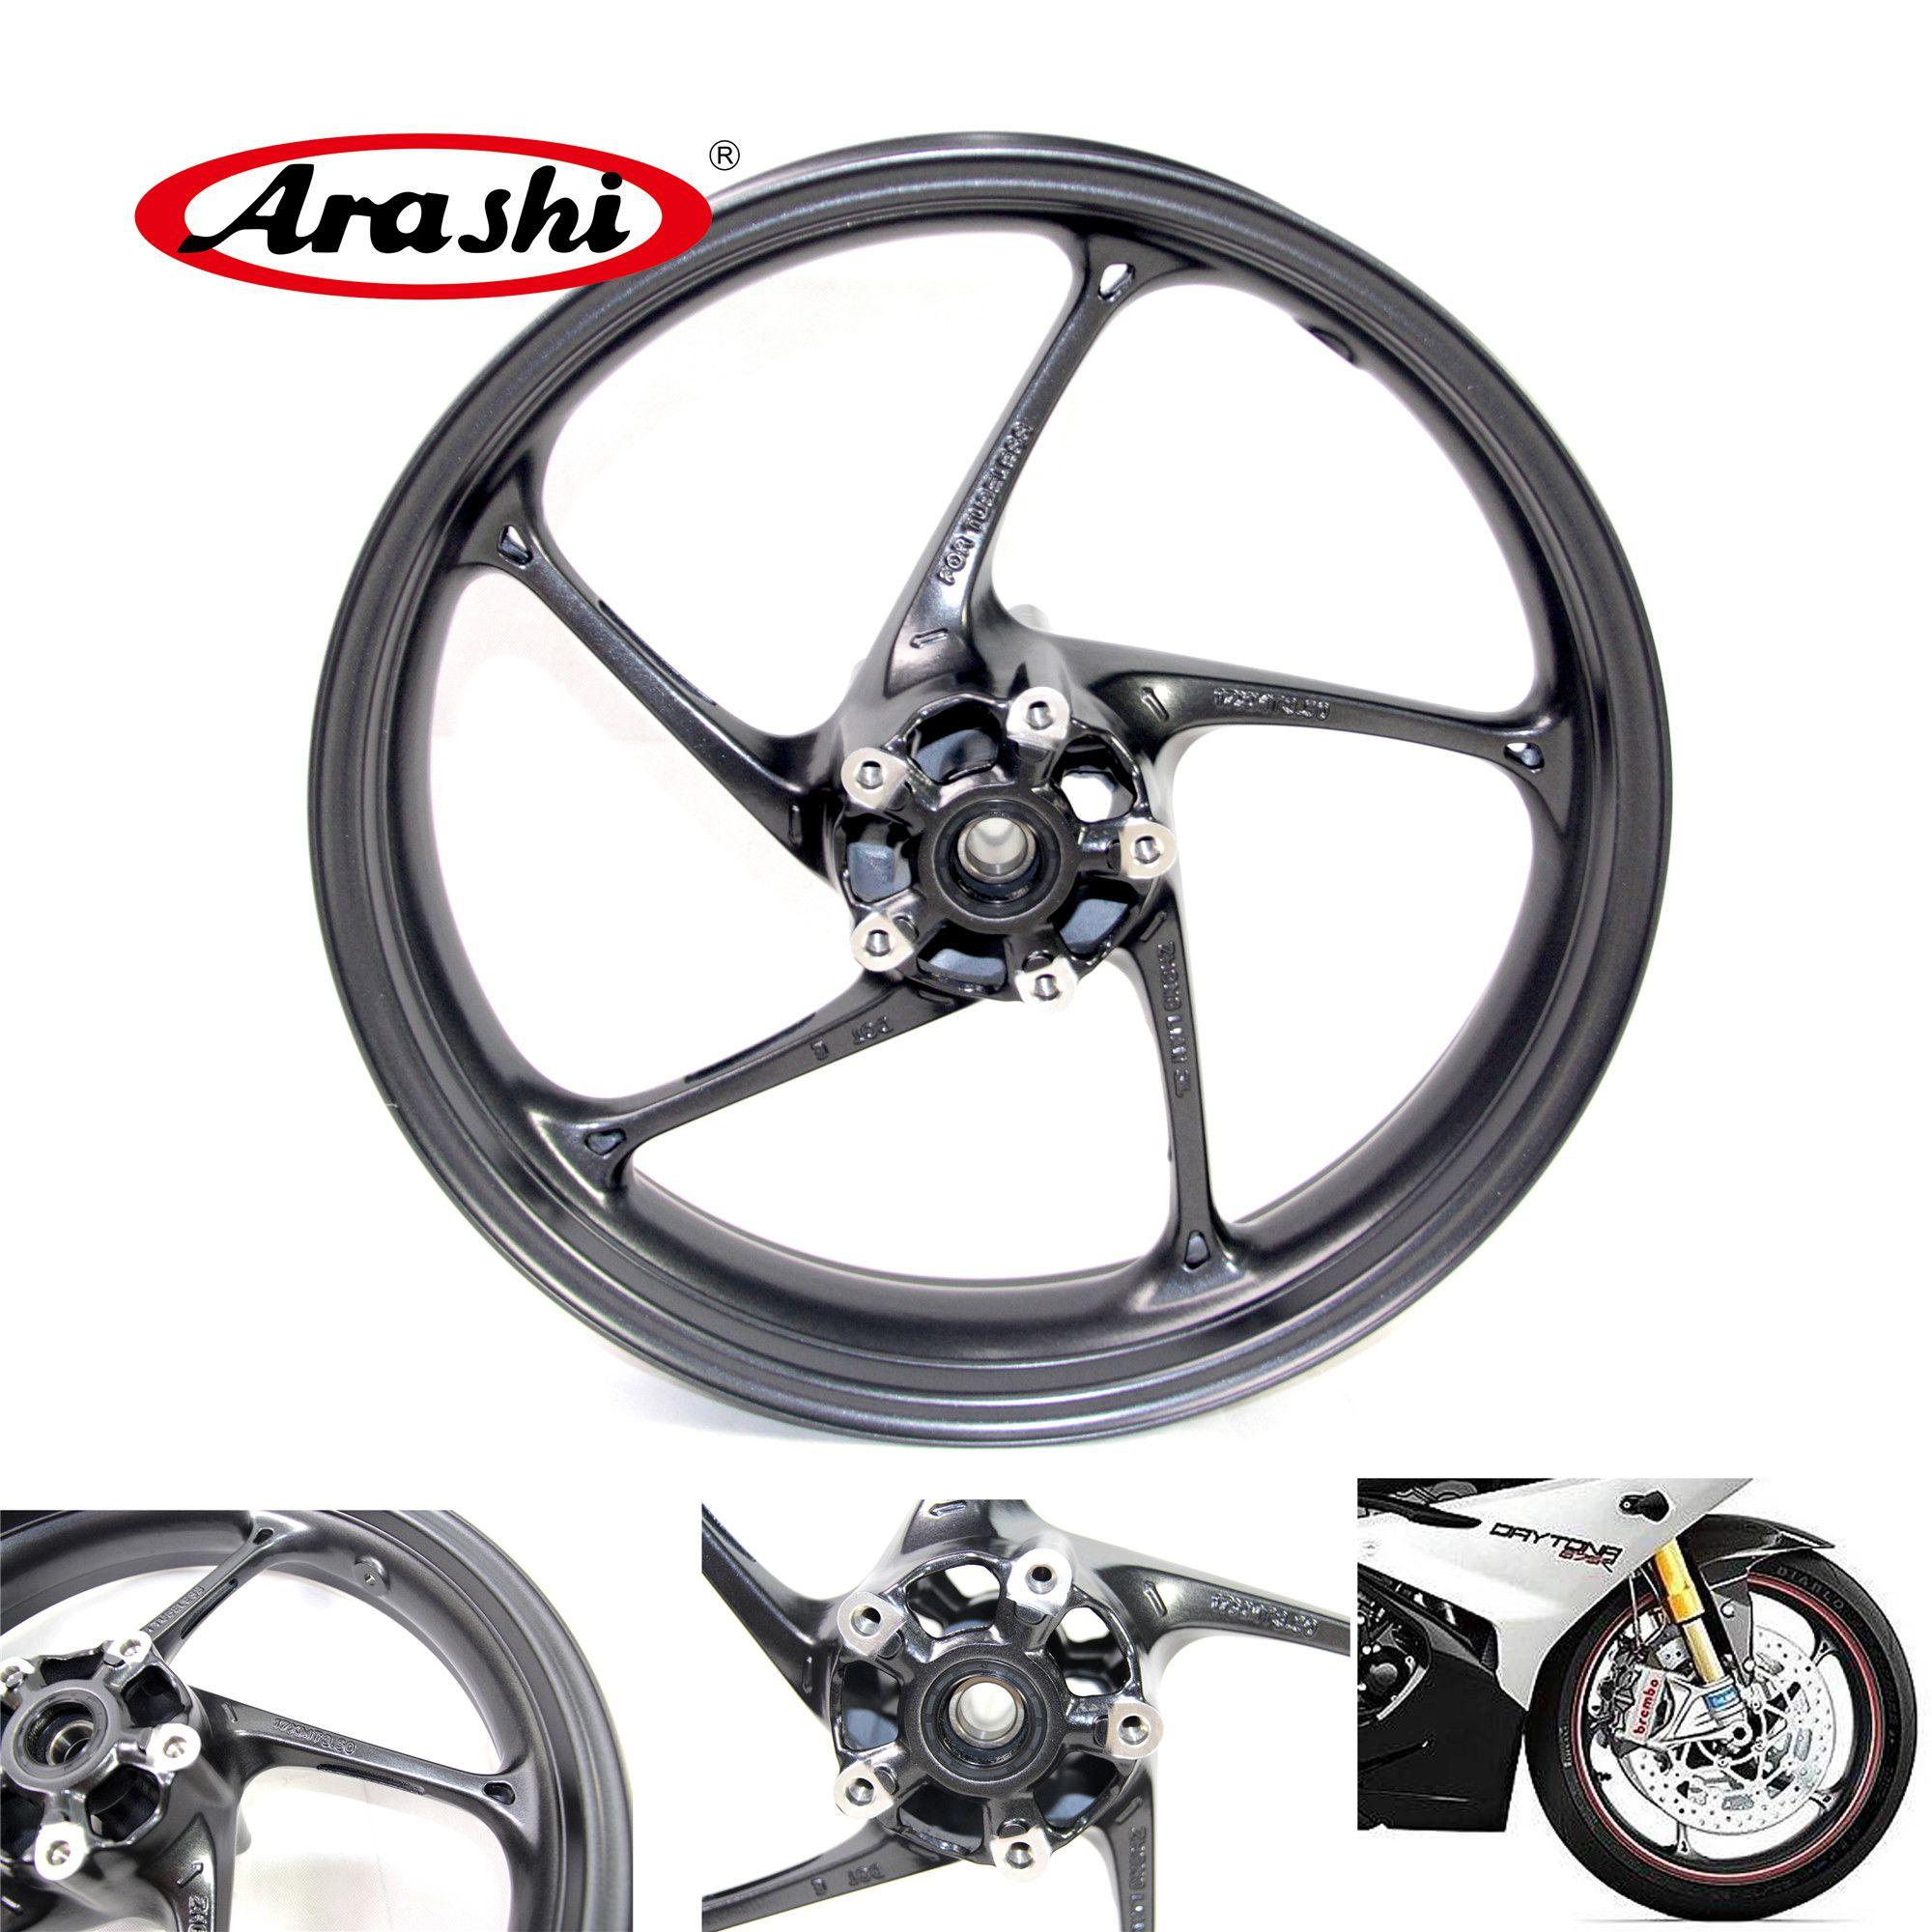 2019 Arashi 675r Front Wheel Rim For Triumph Daytona 675 R 2013 2014